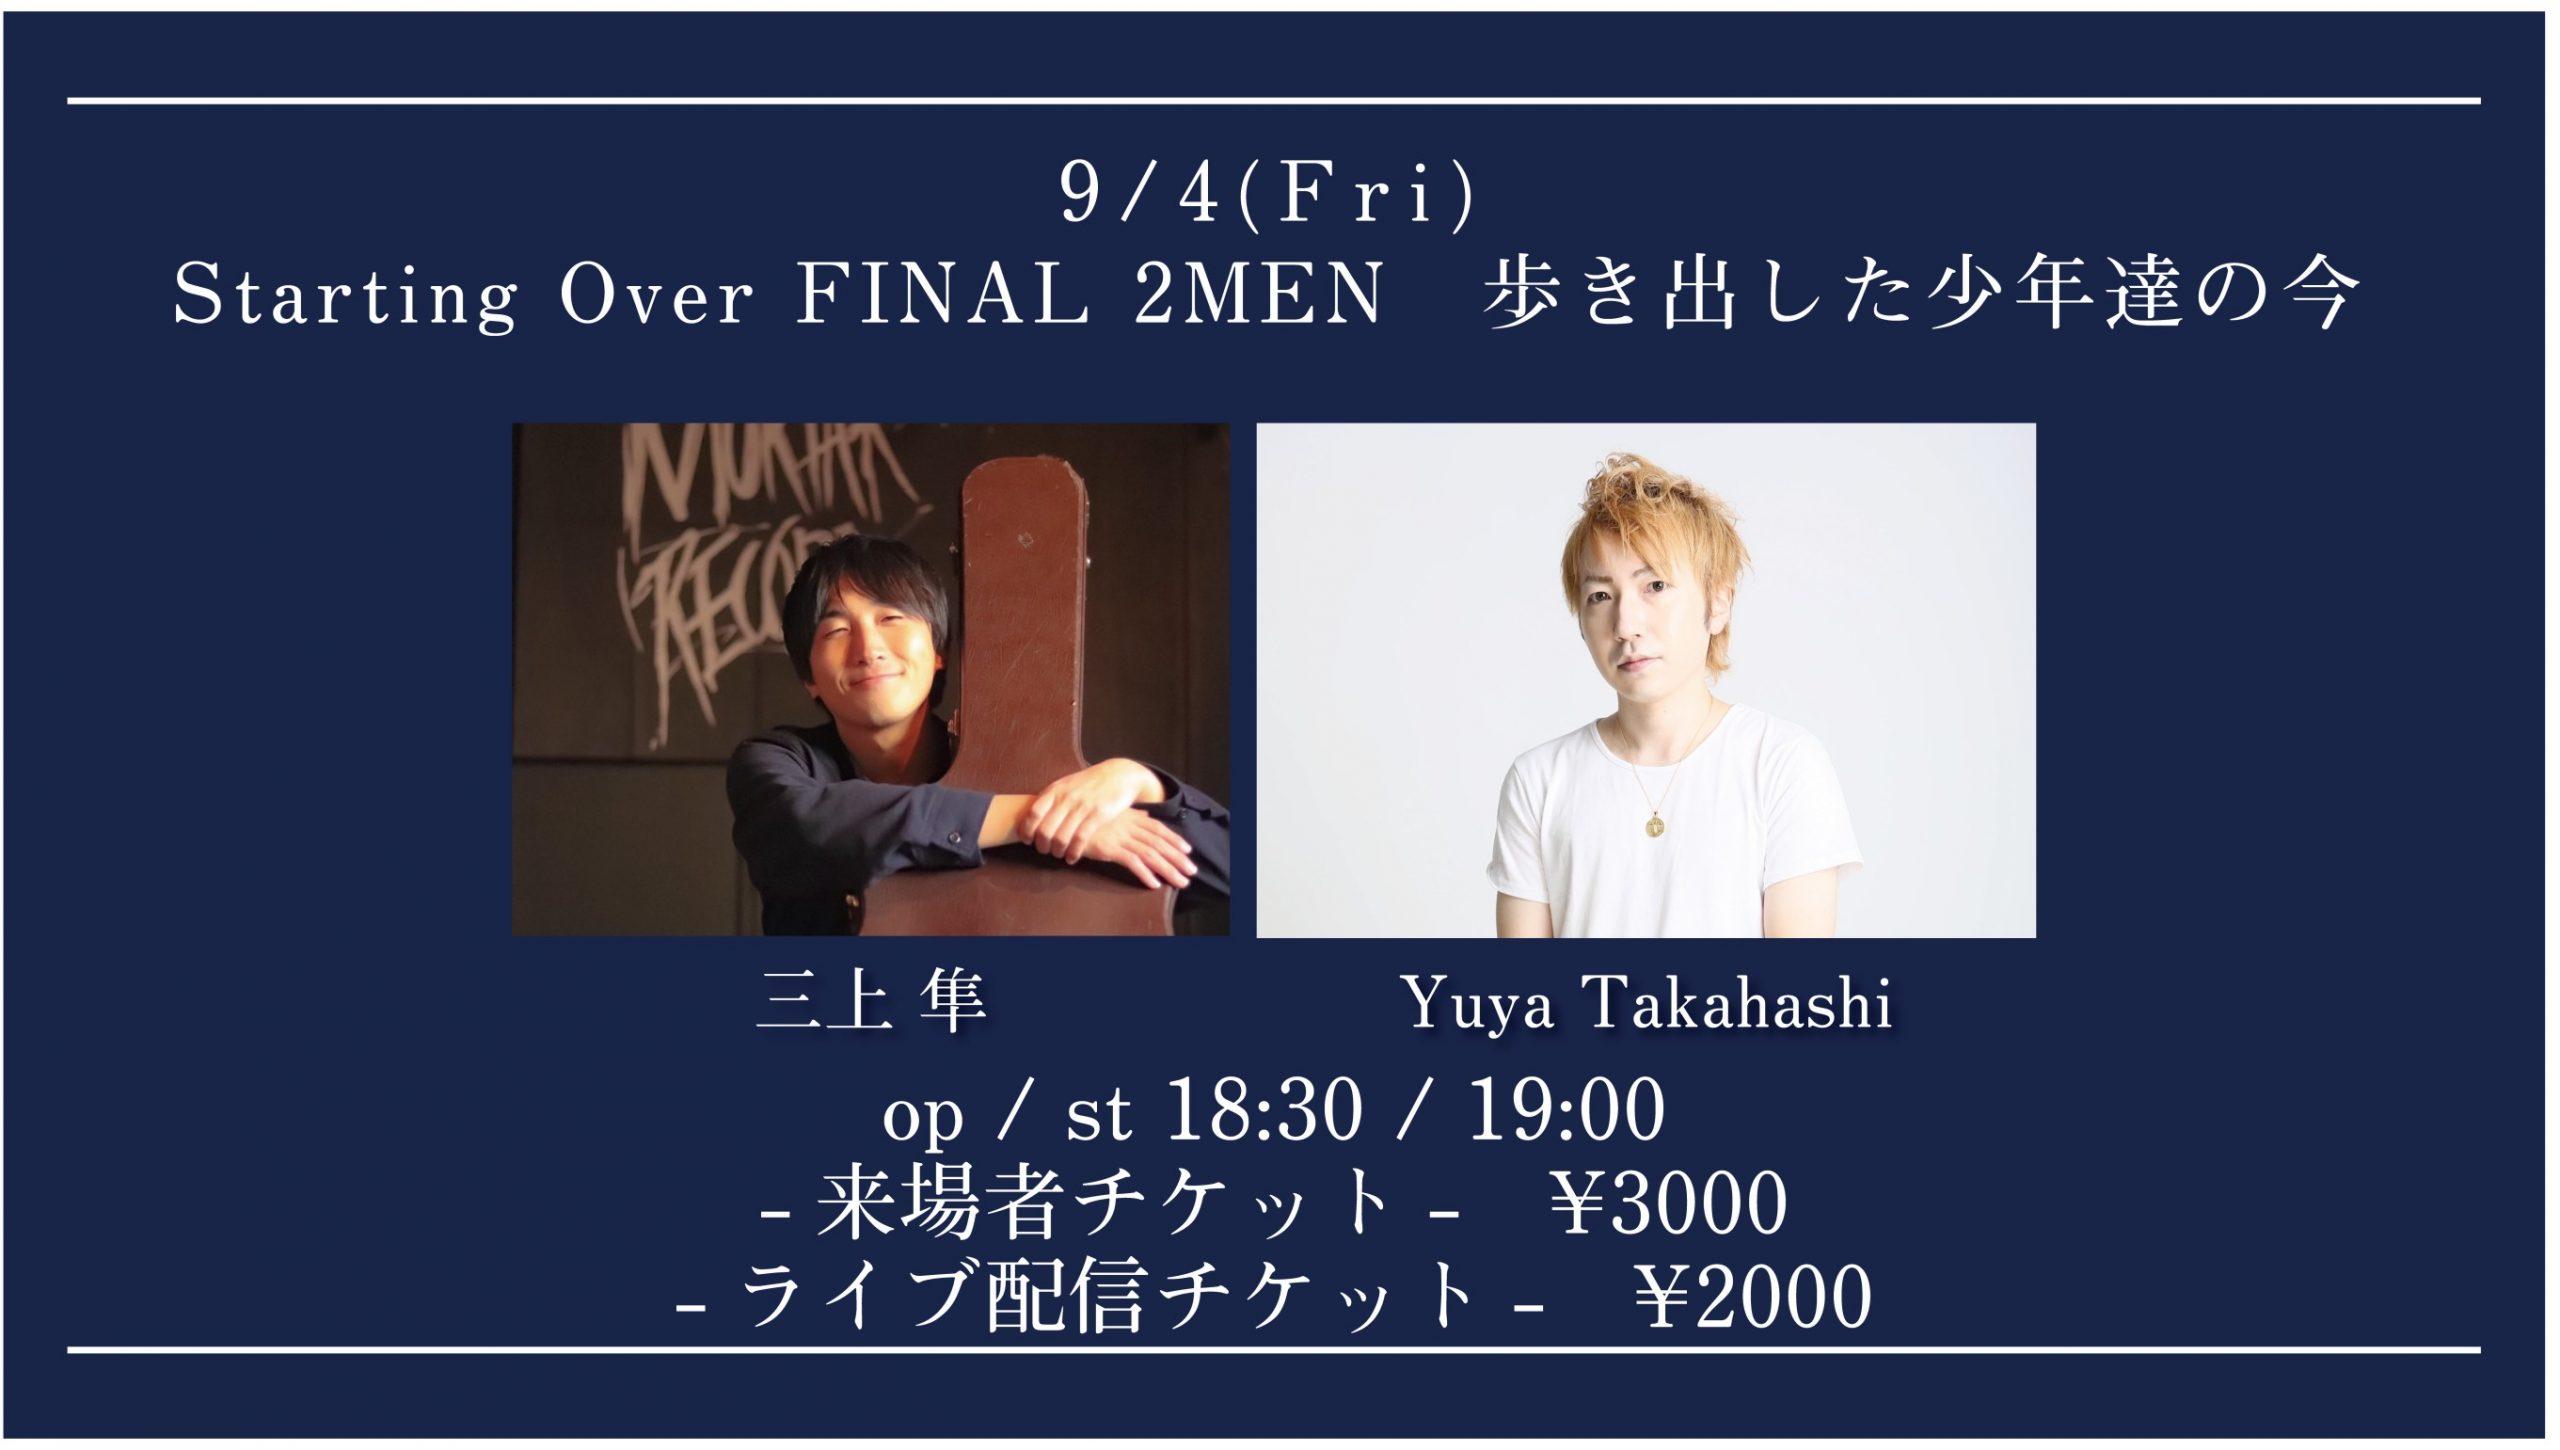 Starting Over FINAL 2MEN 〜歩き出した少年達の今〜